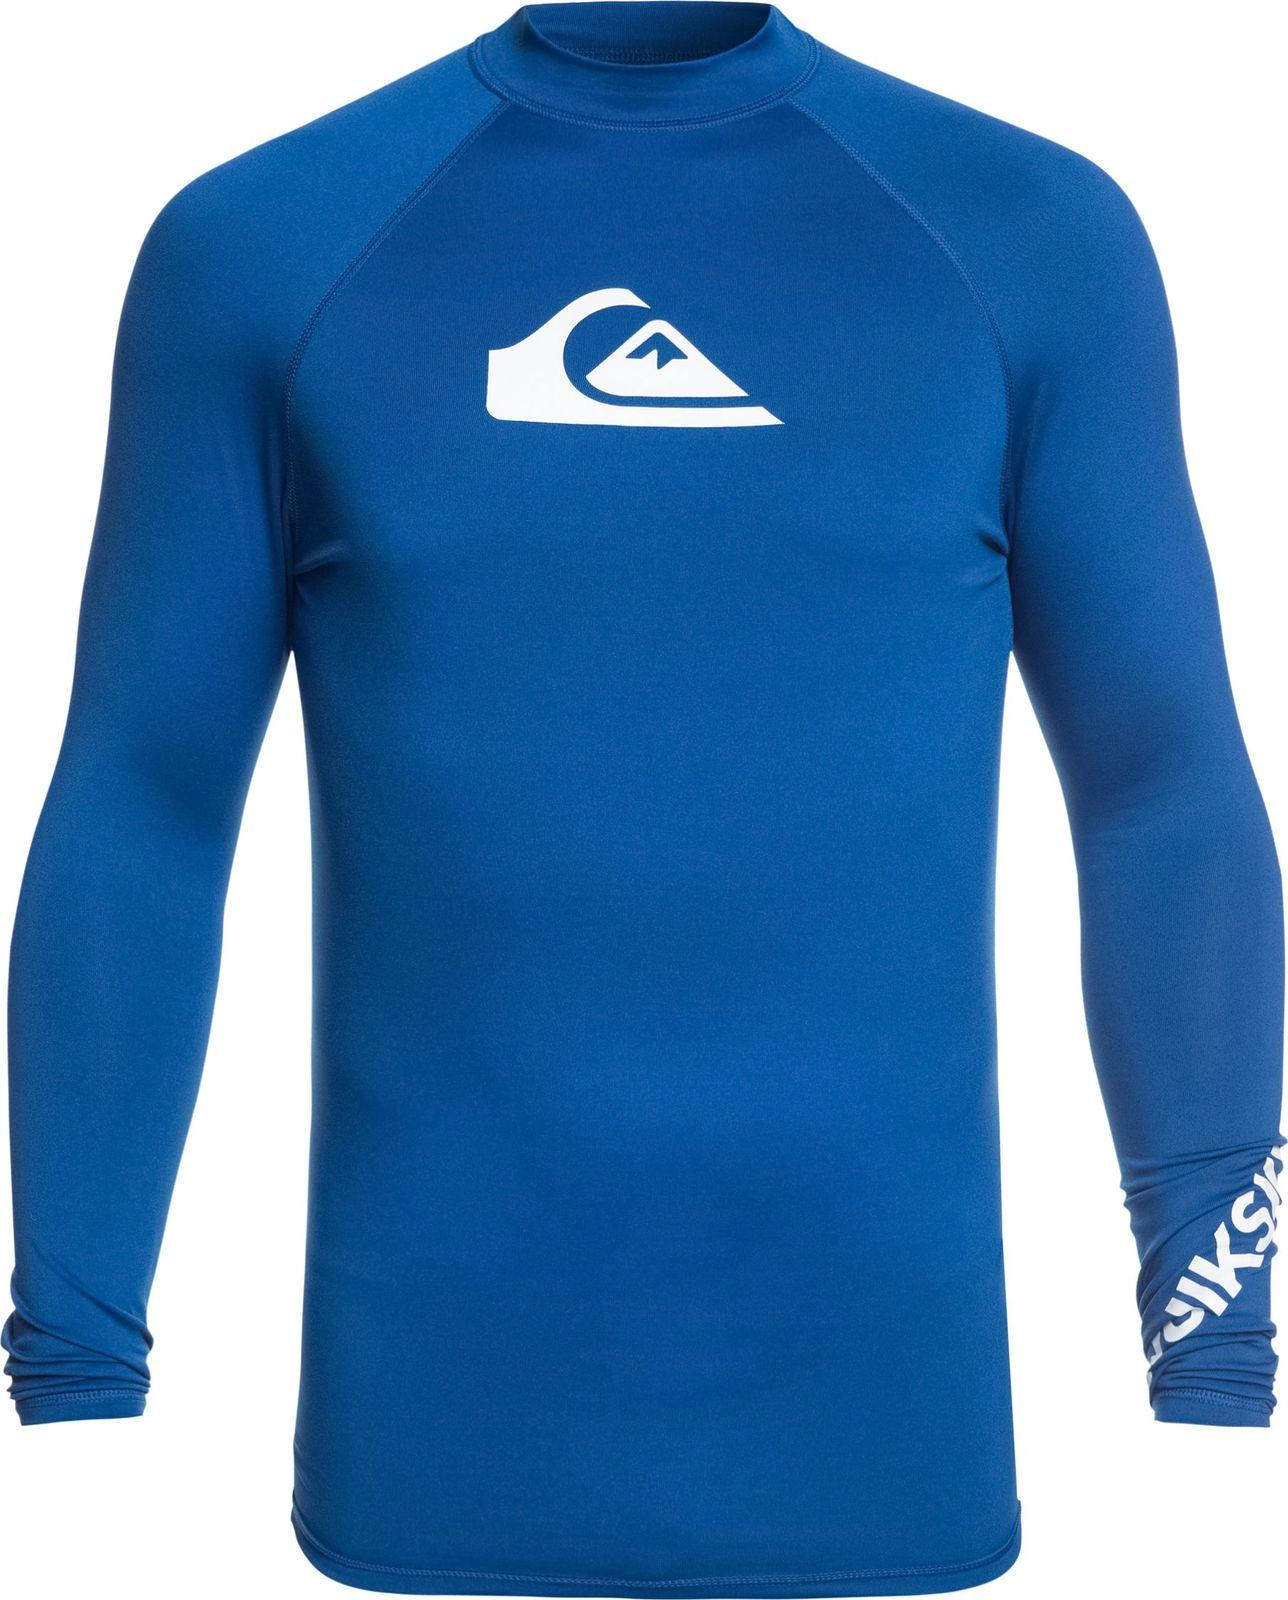 Лонгслив Quiksilver Alltimls лонгслив мужской quiksilver цвет синий eqyzt04974 btk0 размер m 48 50